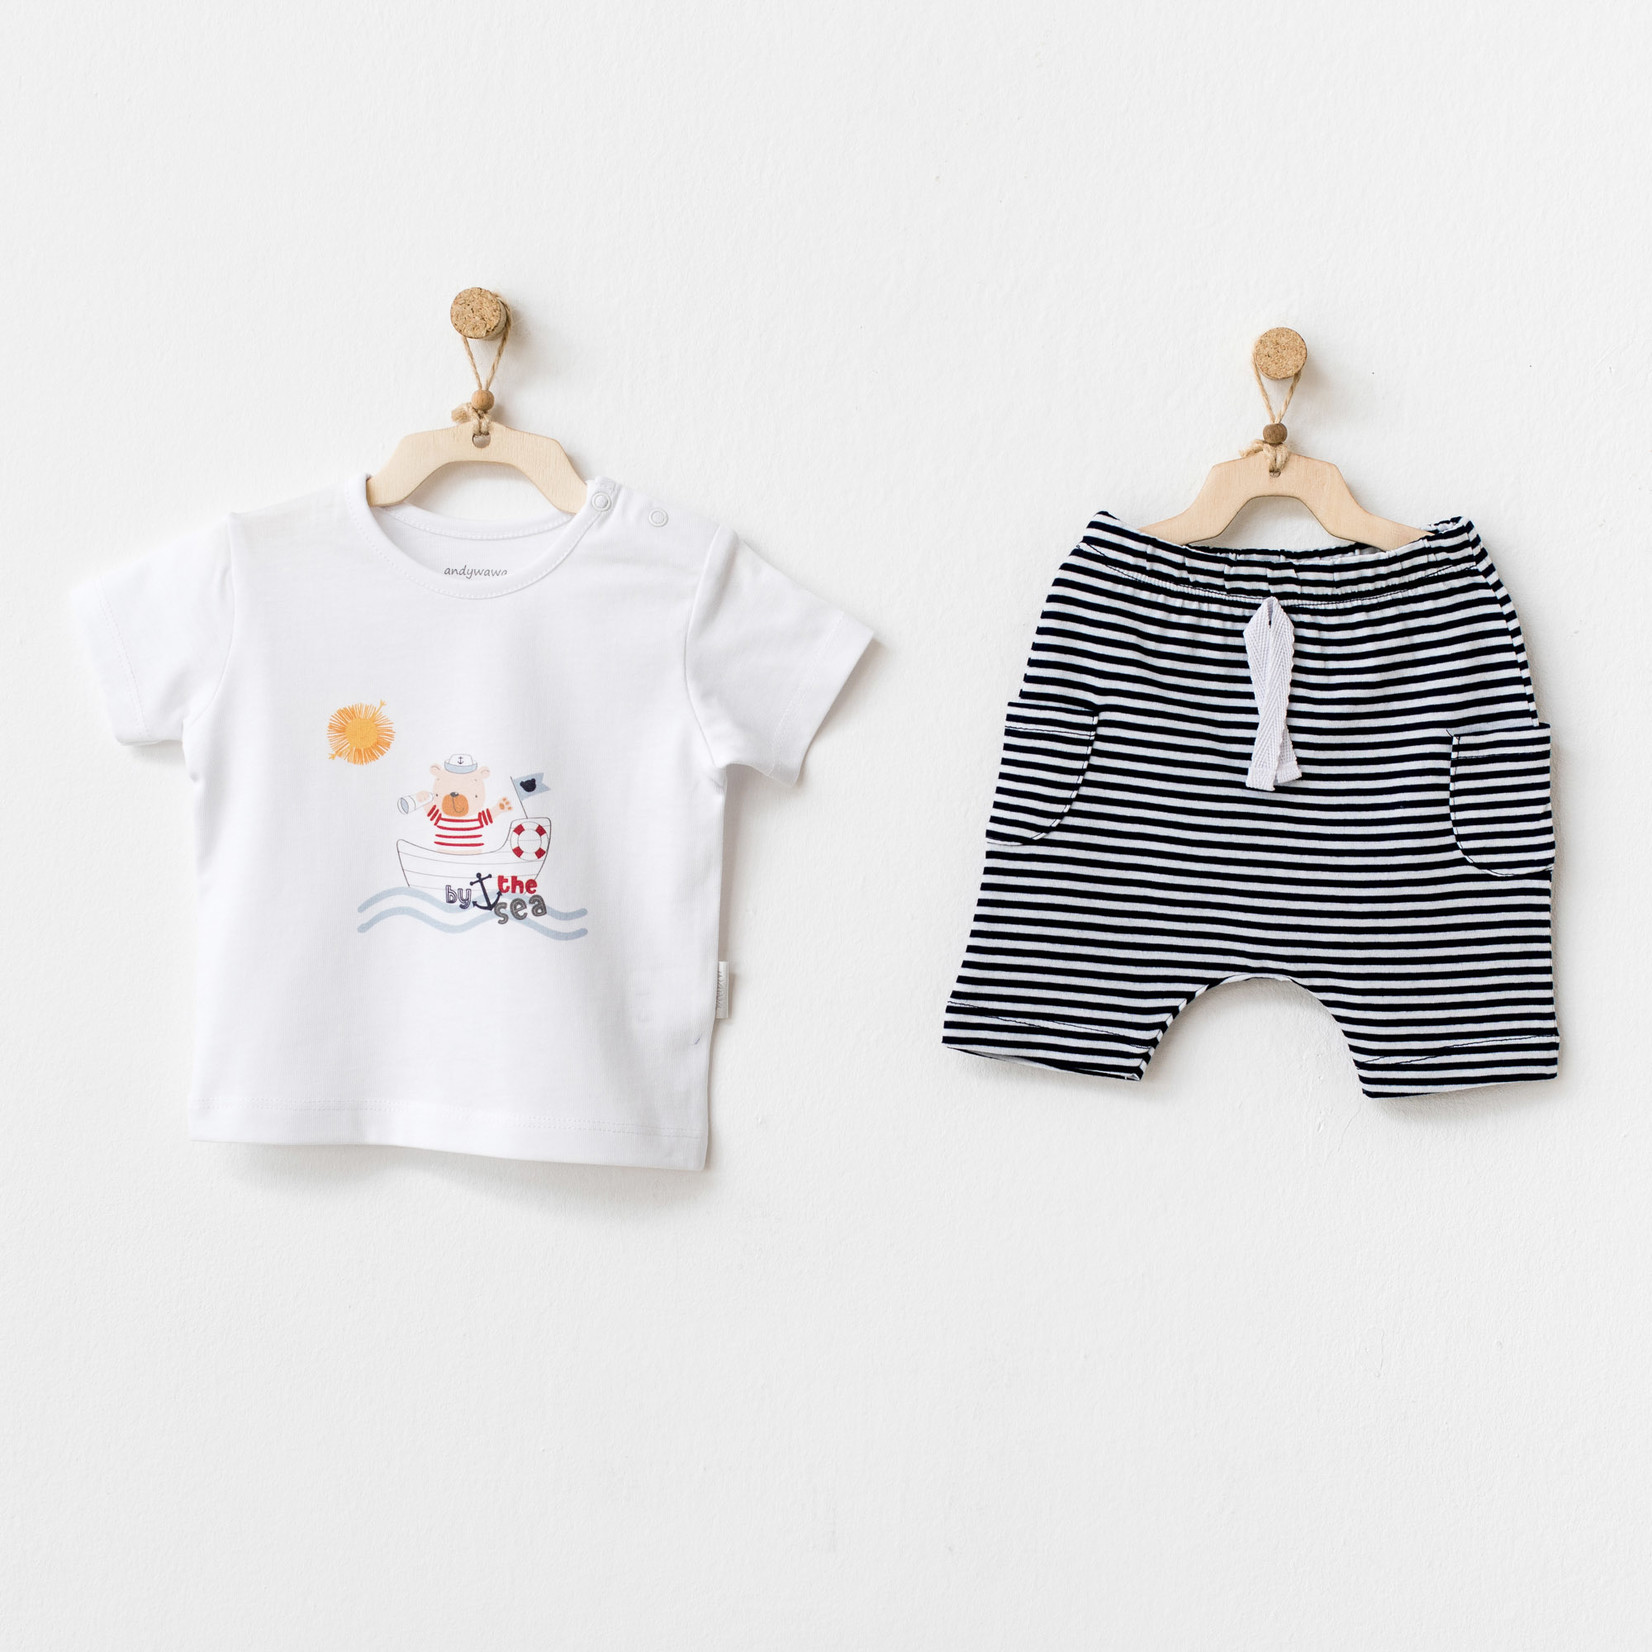 Babyjongens Short & T-shirt Set